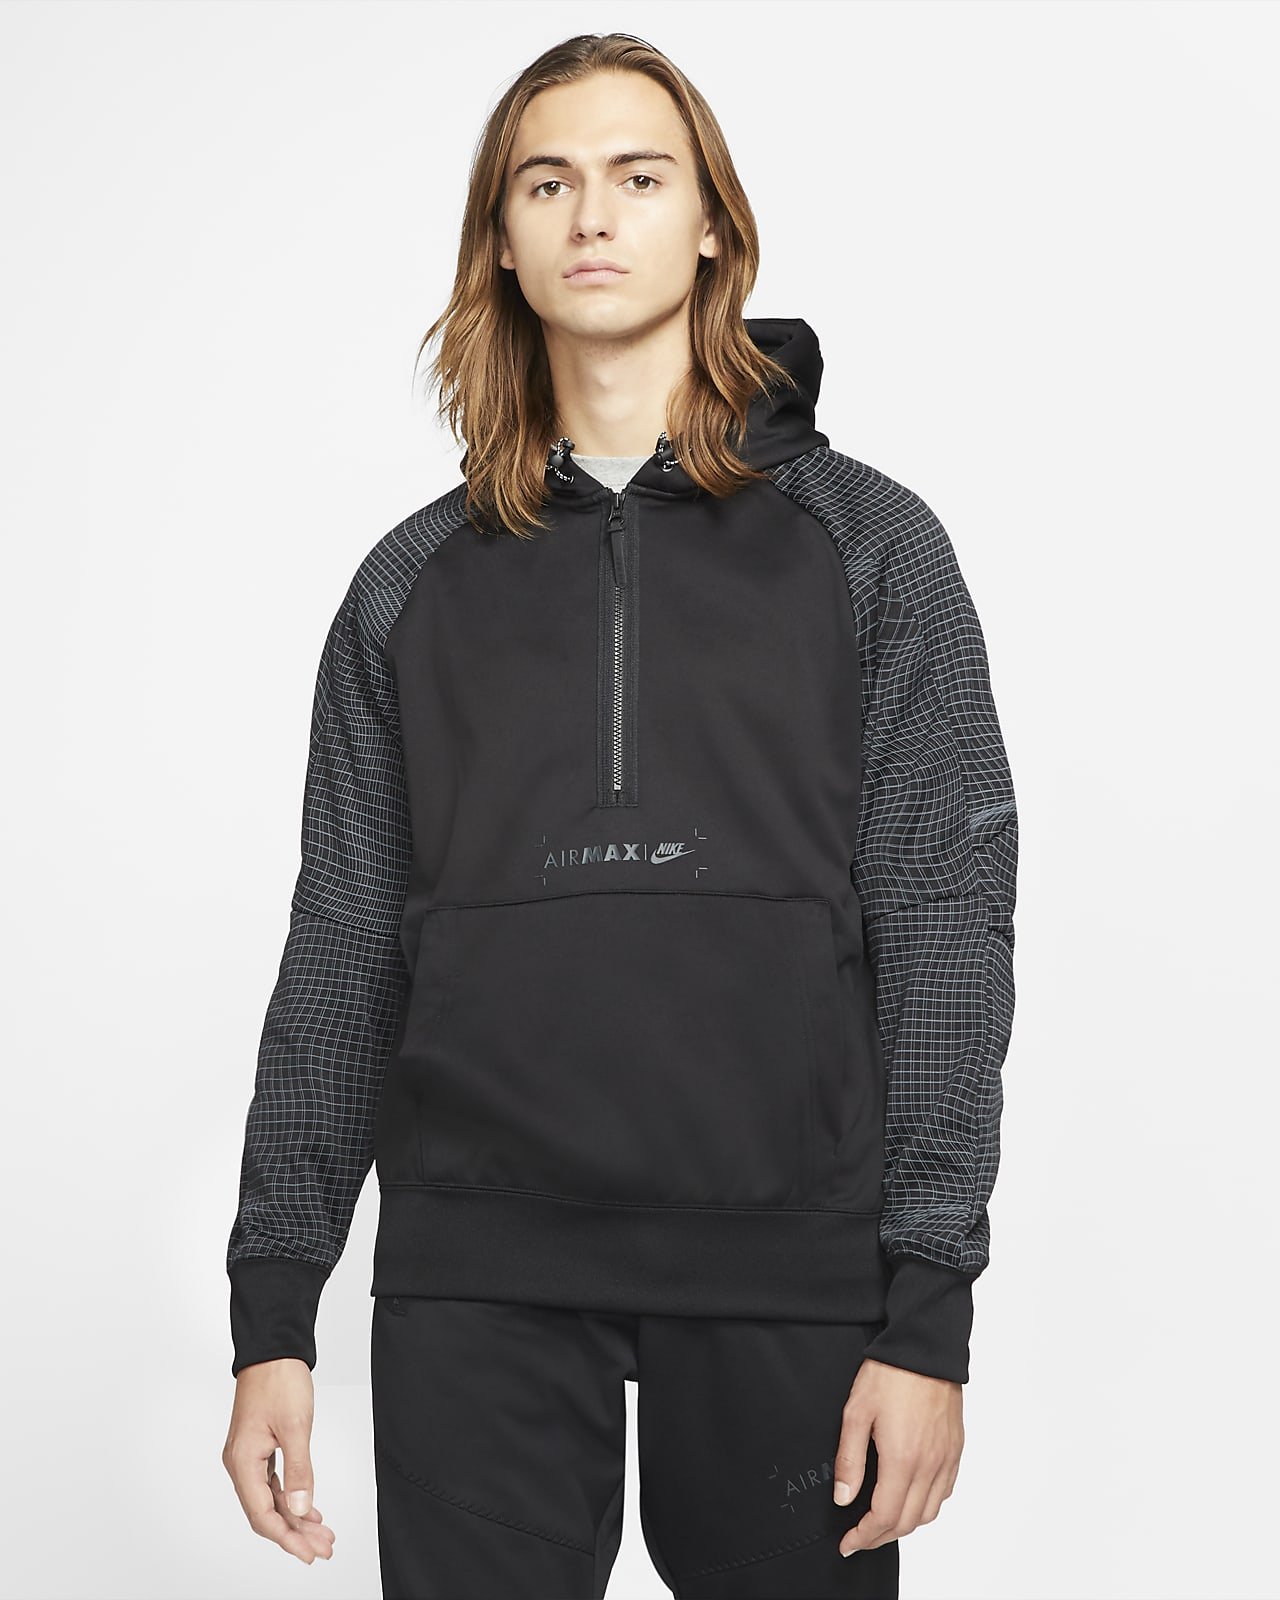 Sweat à capuche à demi-zip en tissu Fleece Nike Sportswear Air Max pour Homme